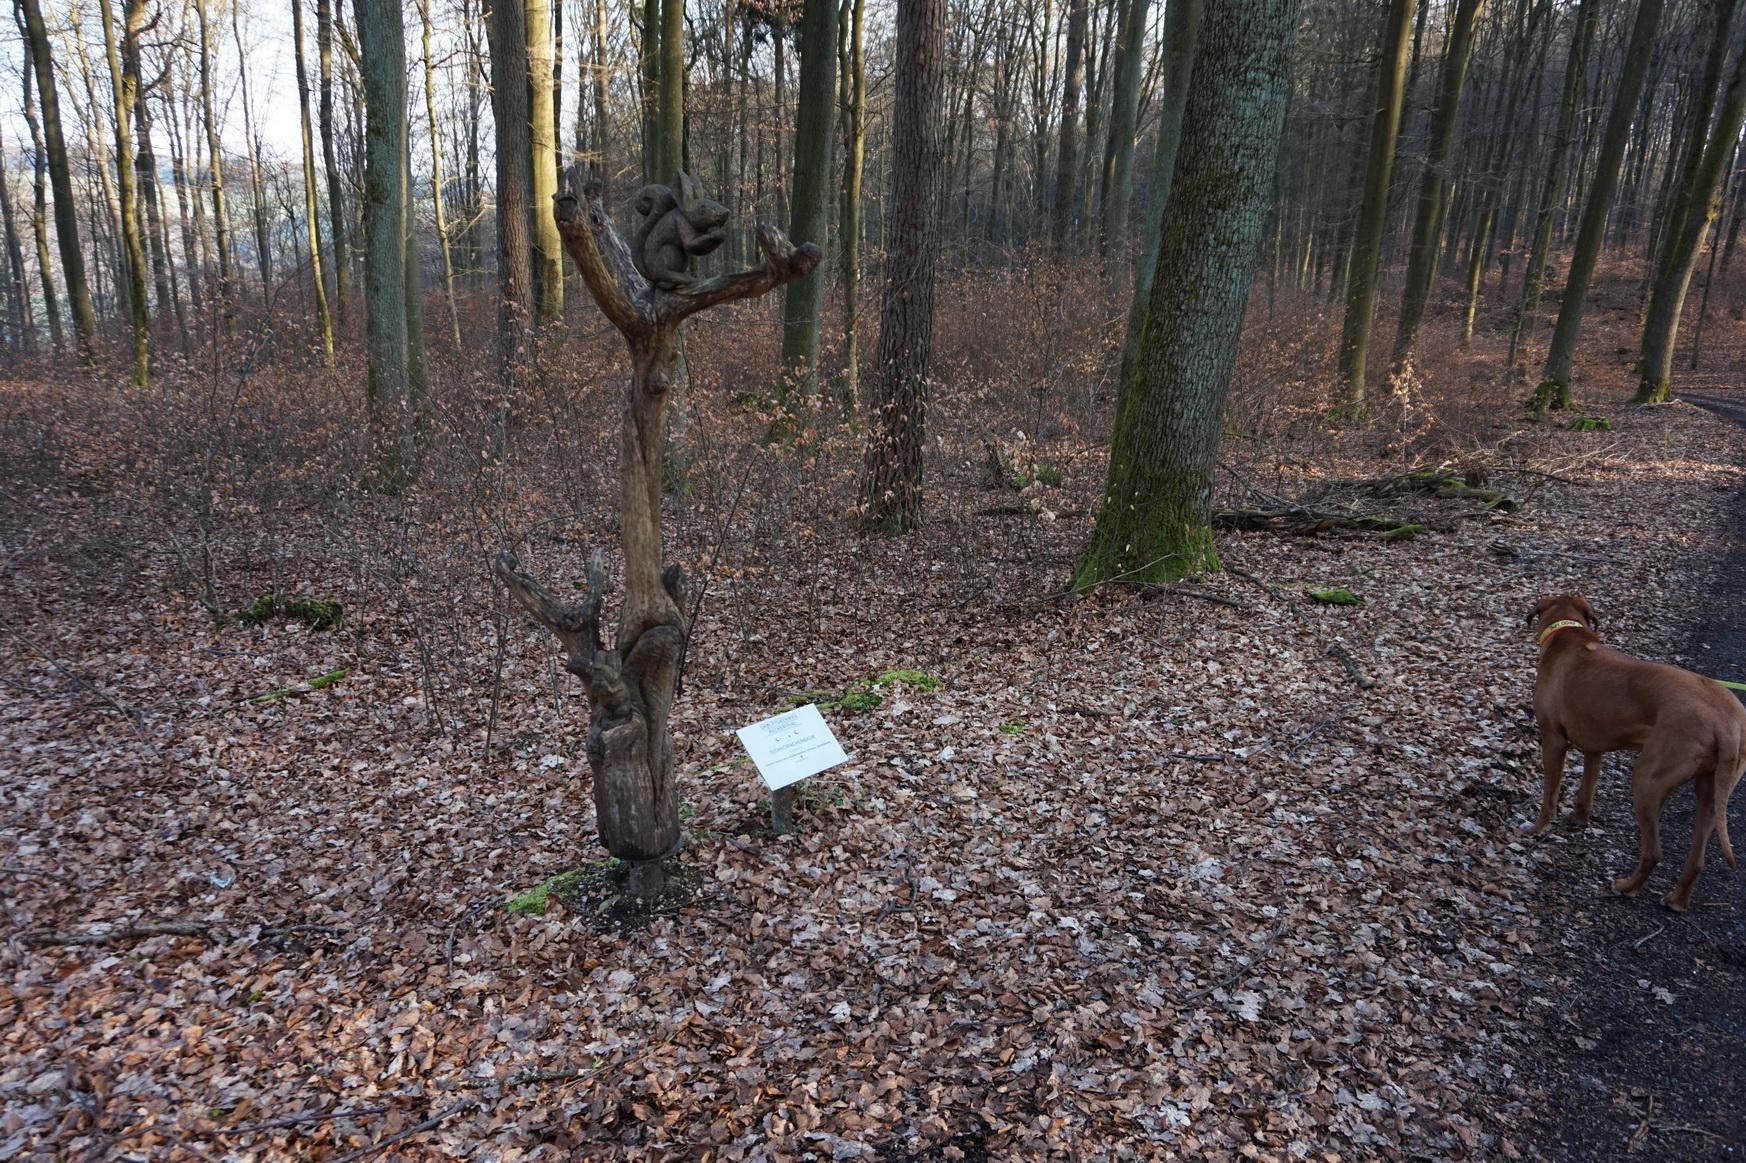 Eichhörnchenbaum, Simone Carole Levy